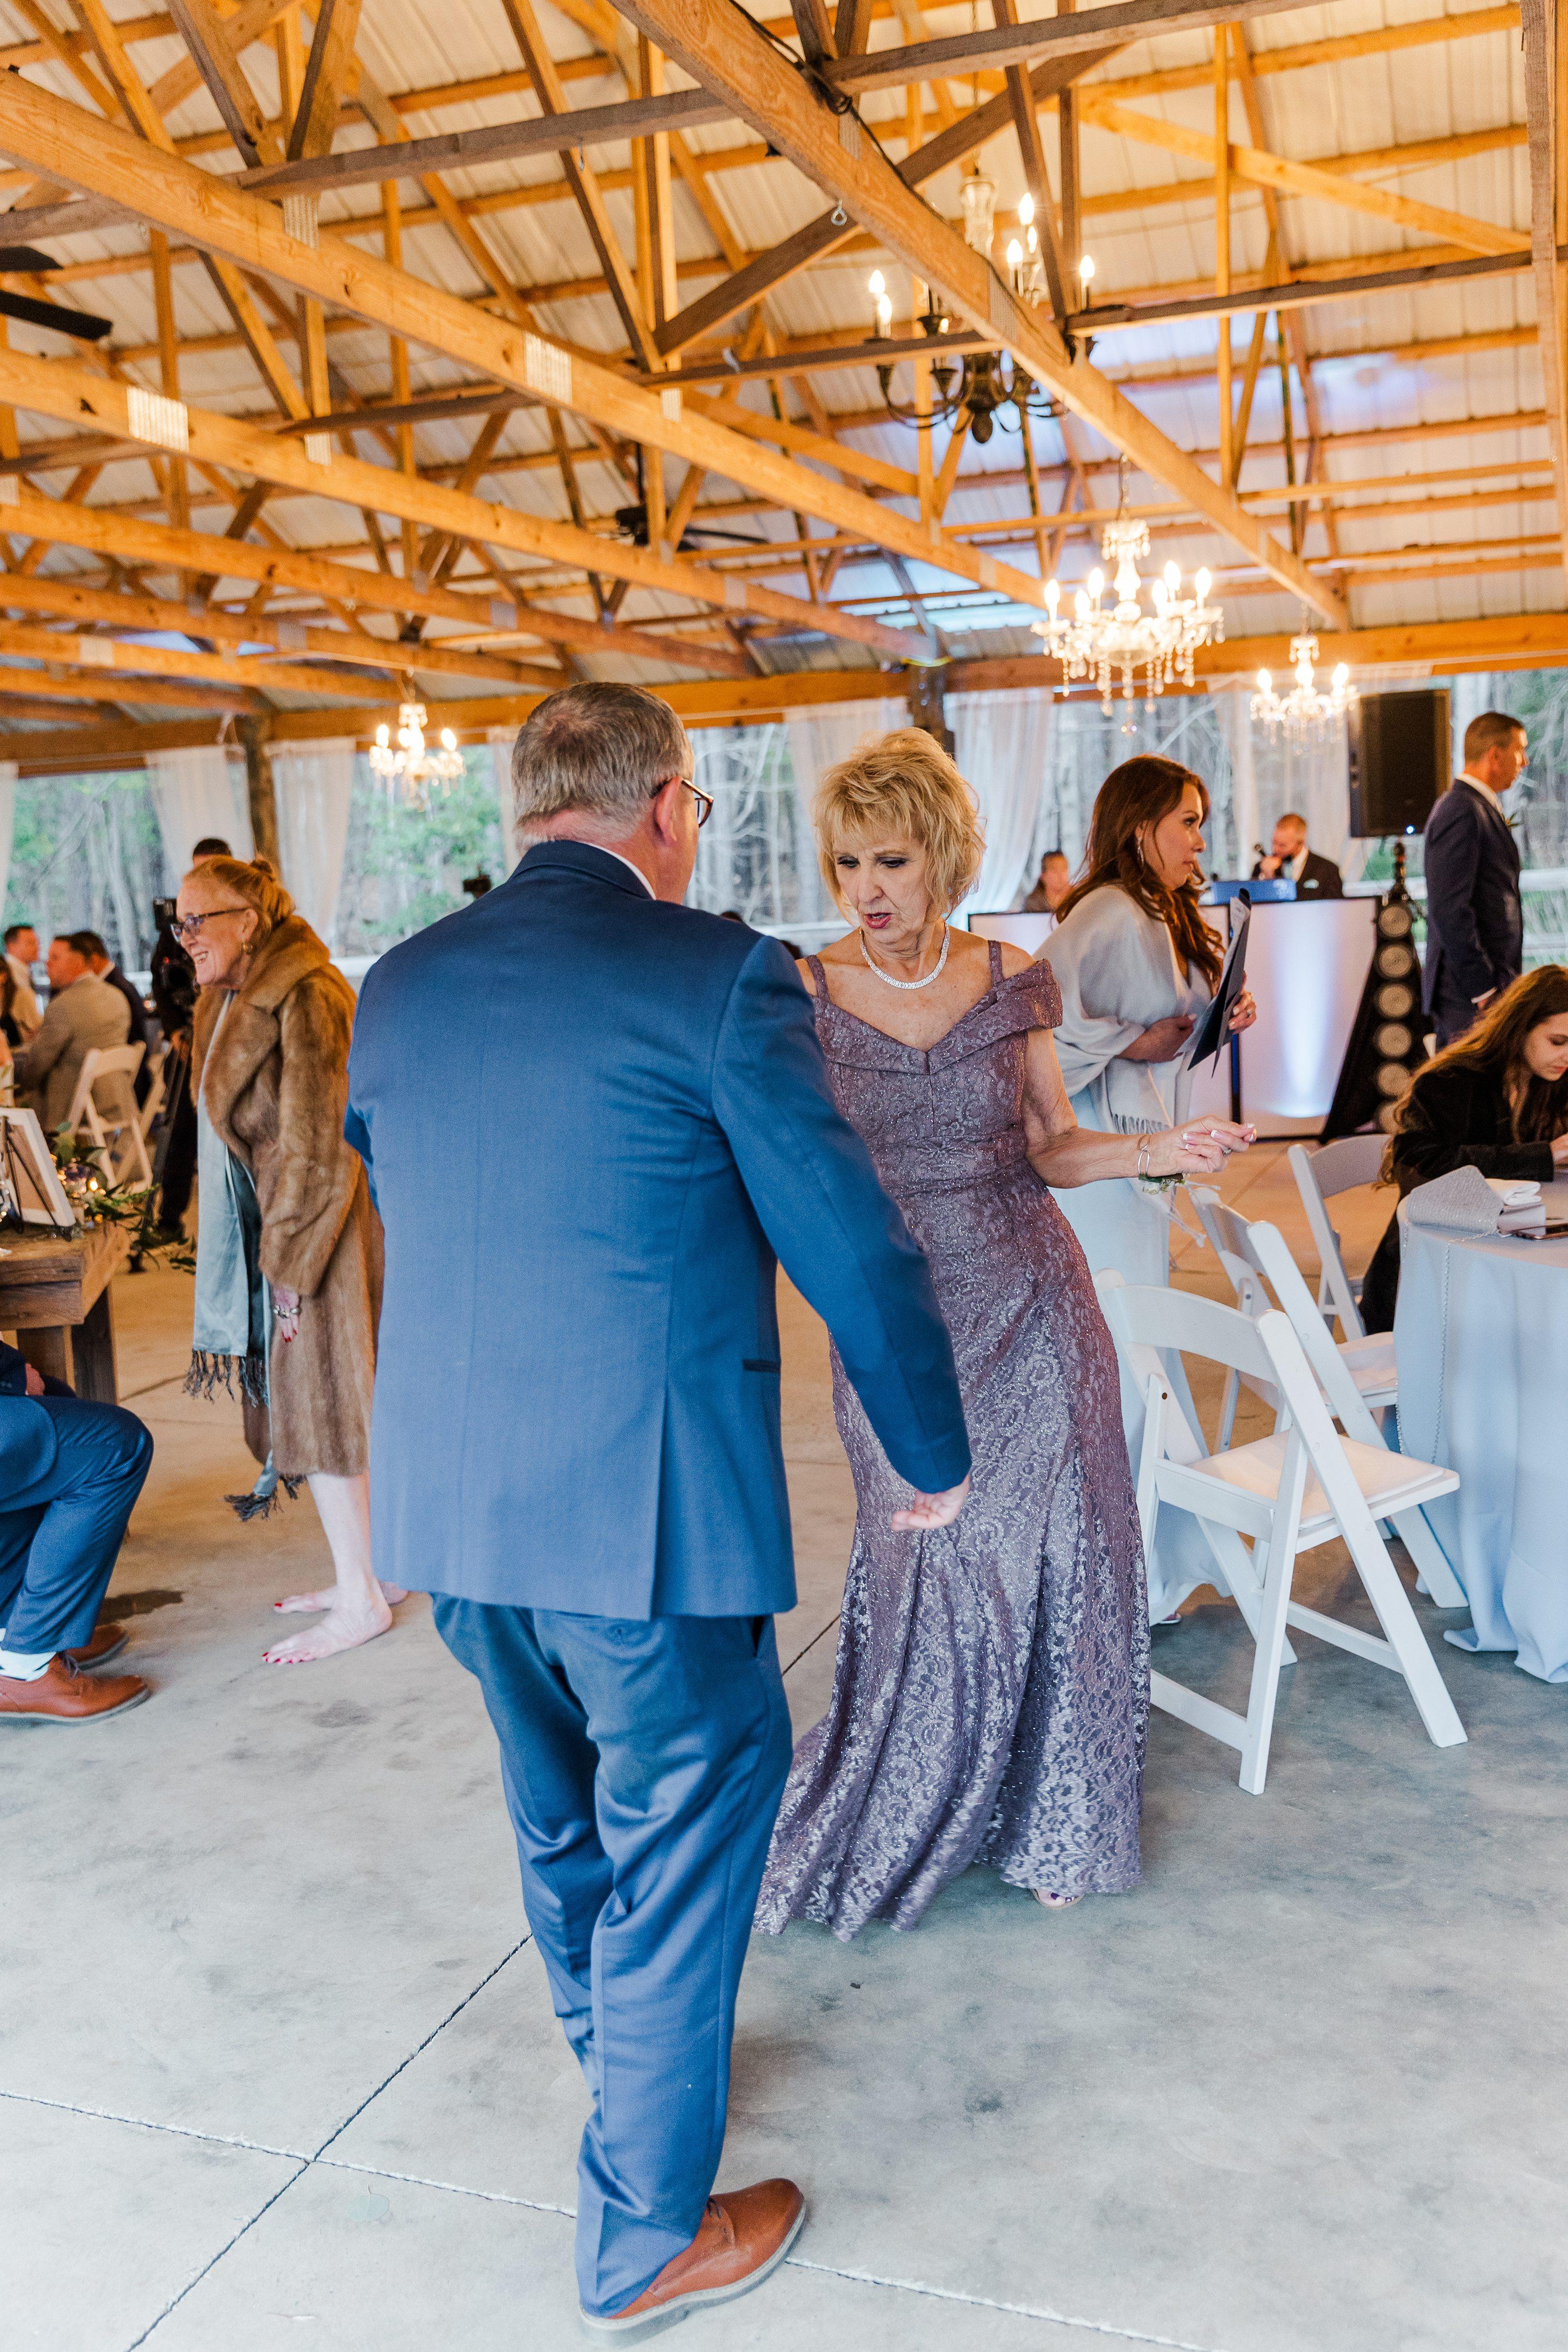 Pinehurst Wedding Photographer,Pinehurst NC